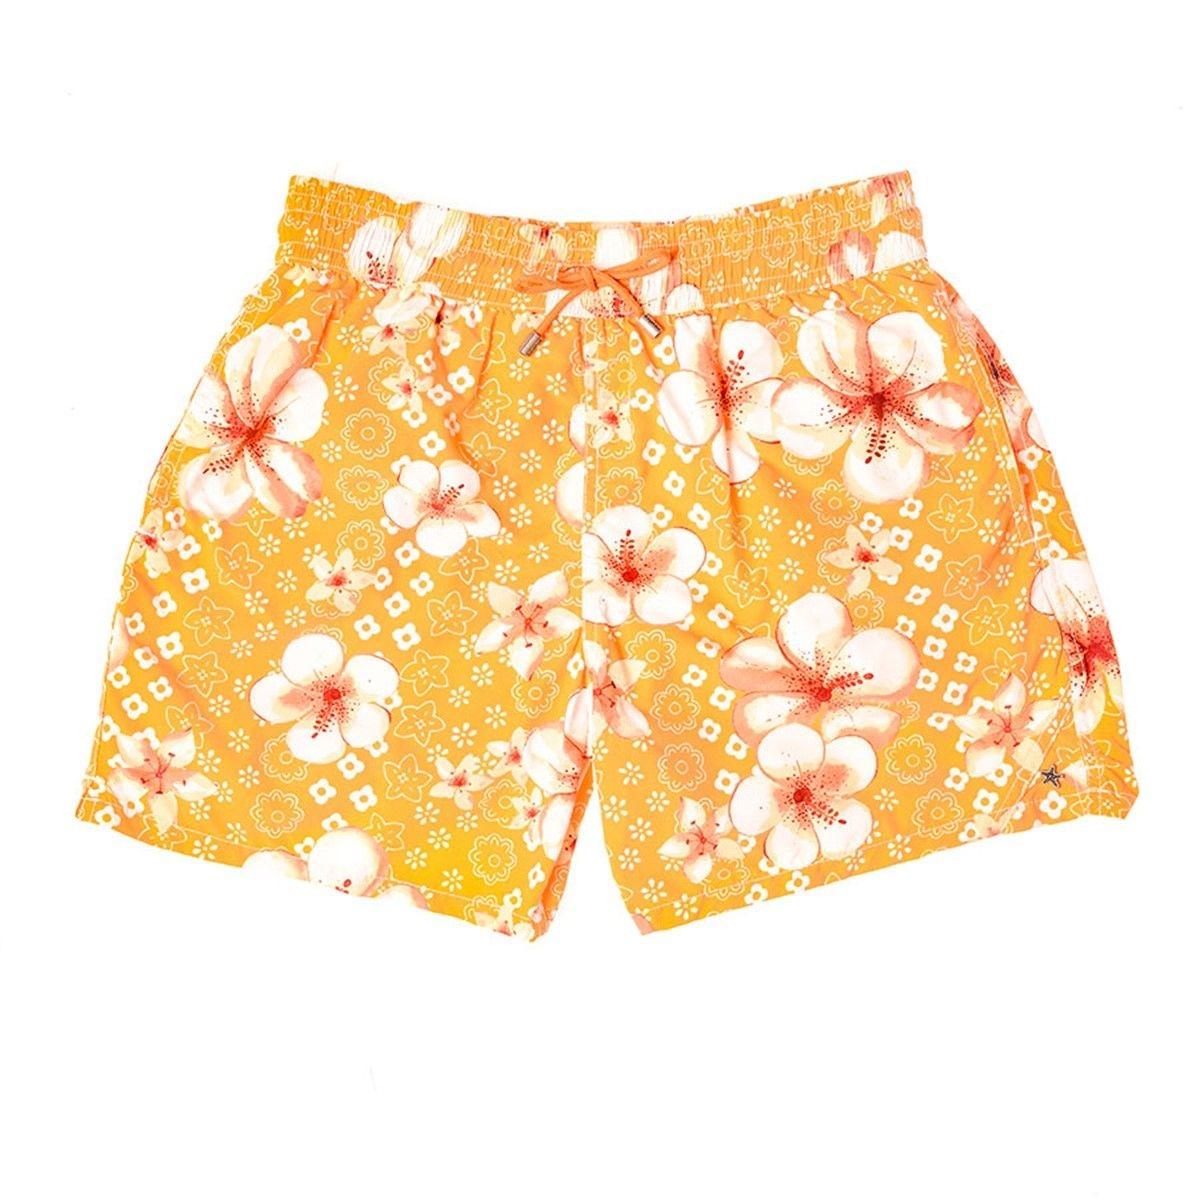 Maillot de bain orange fleurs blanches PALAWAN